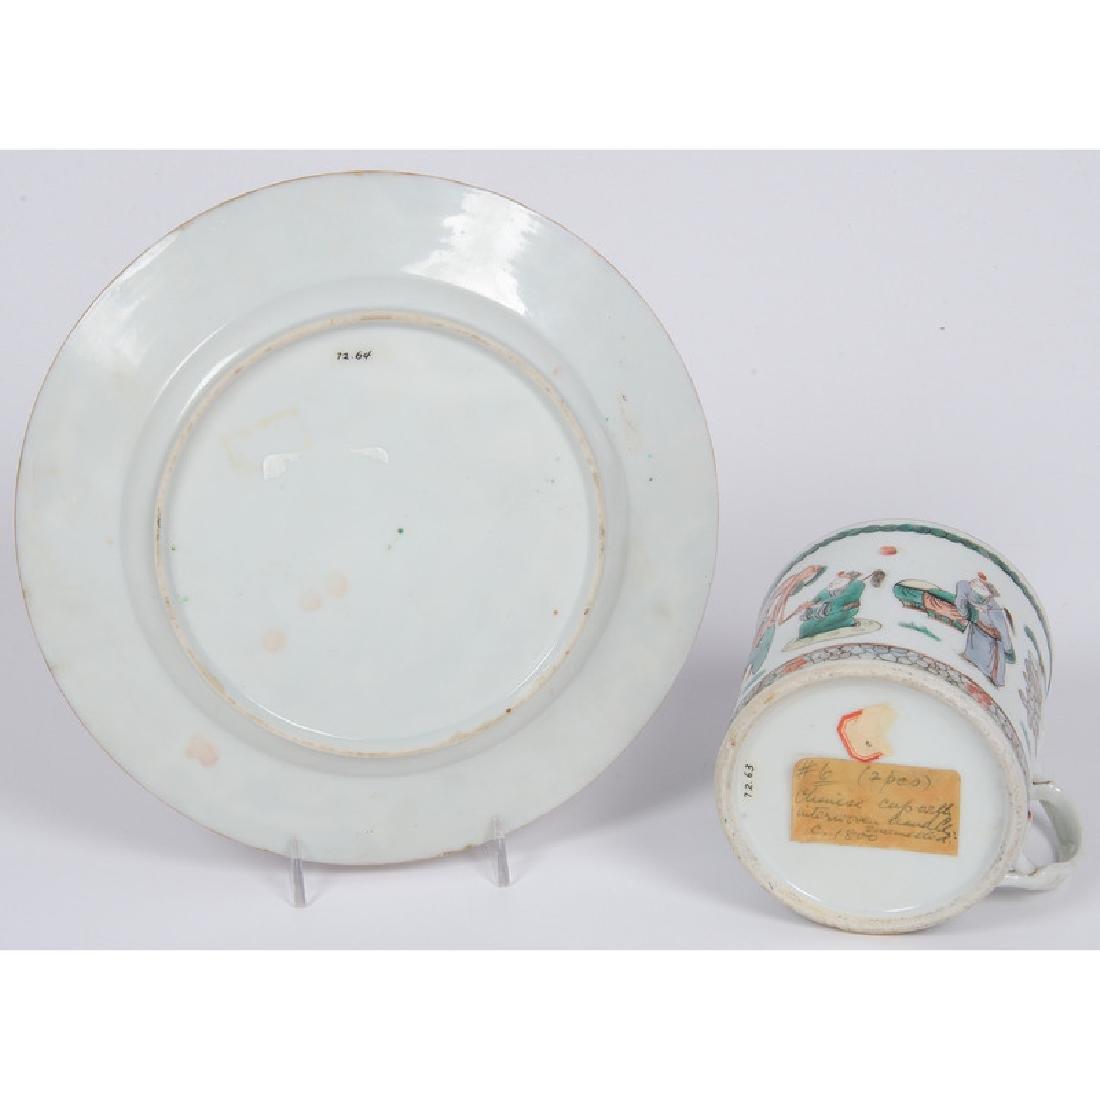 Chinese Export Mug and Plate - 5